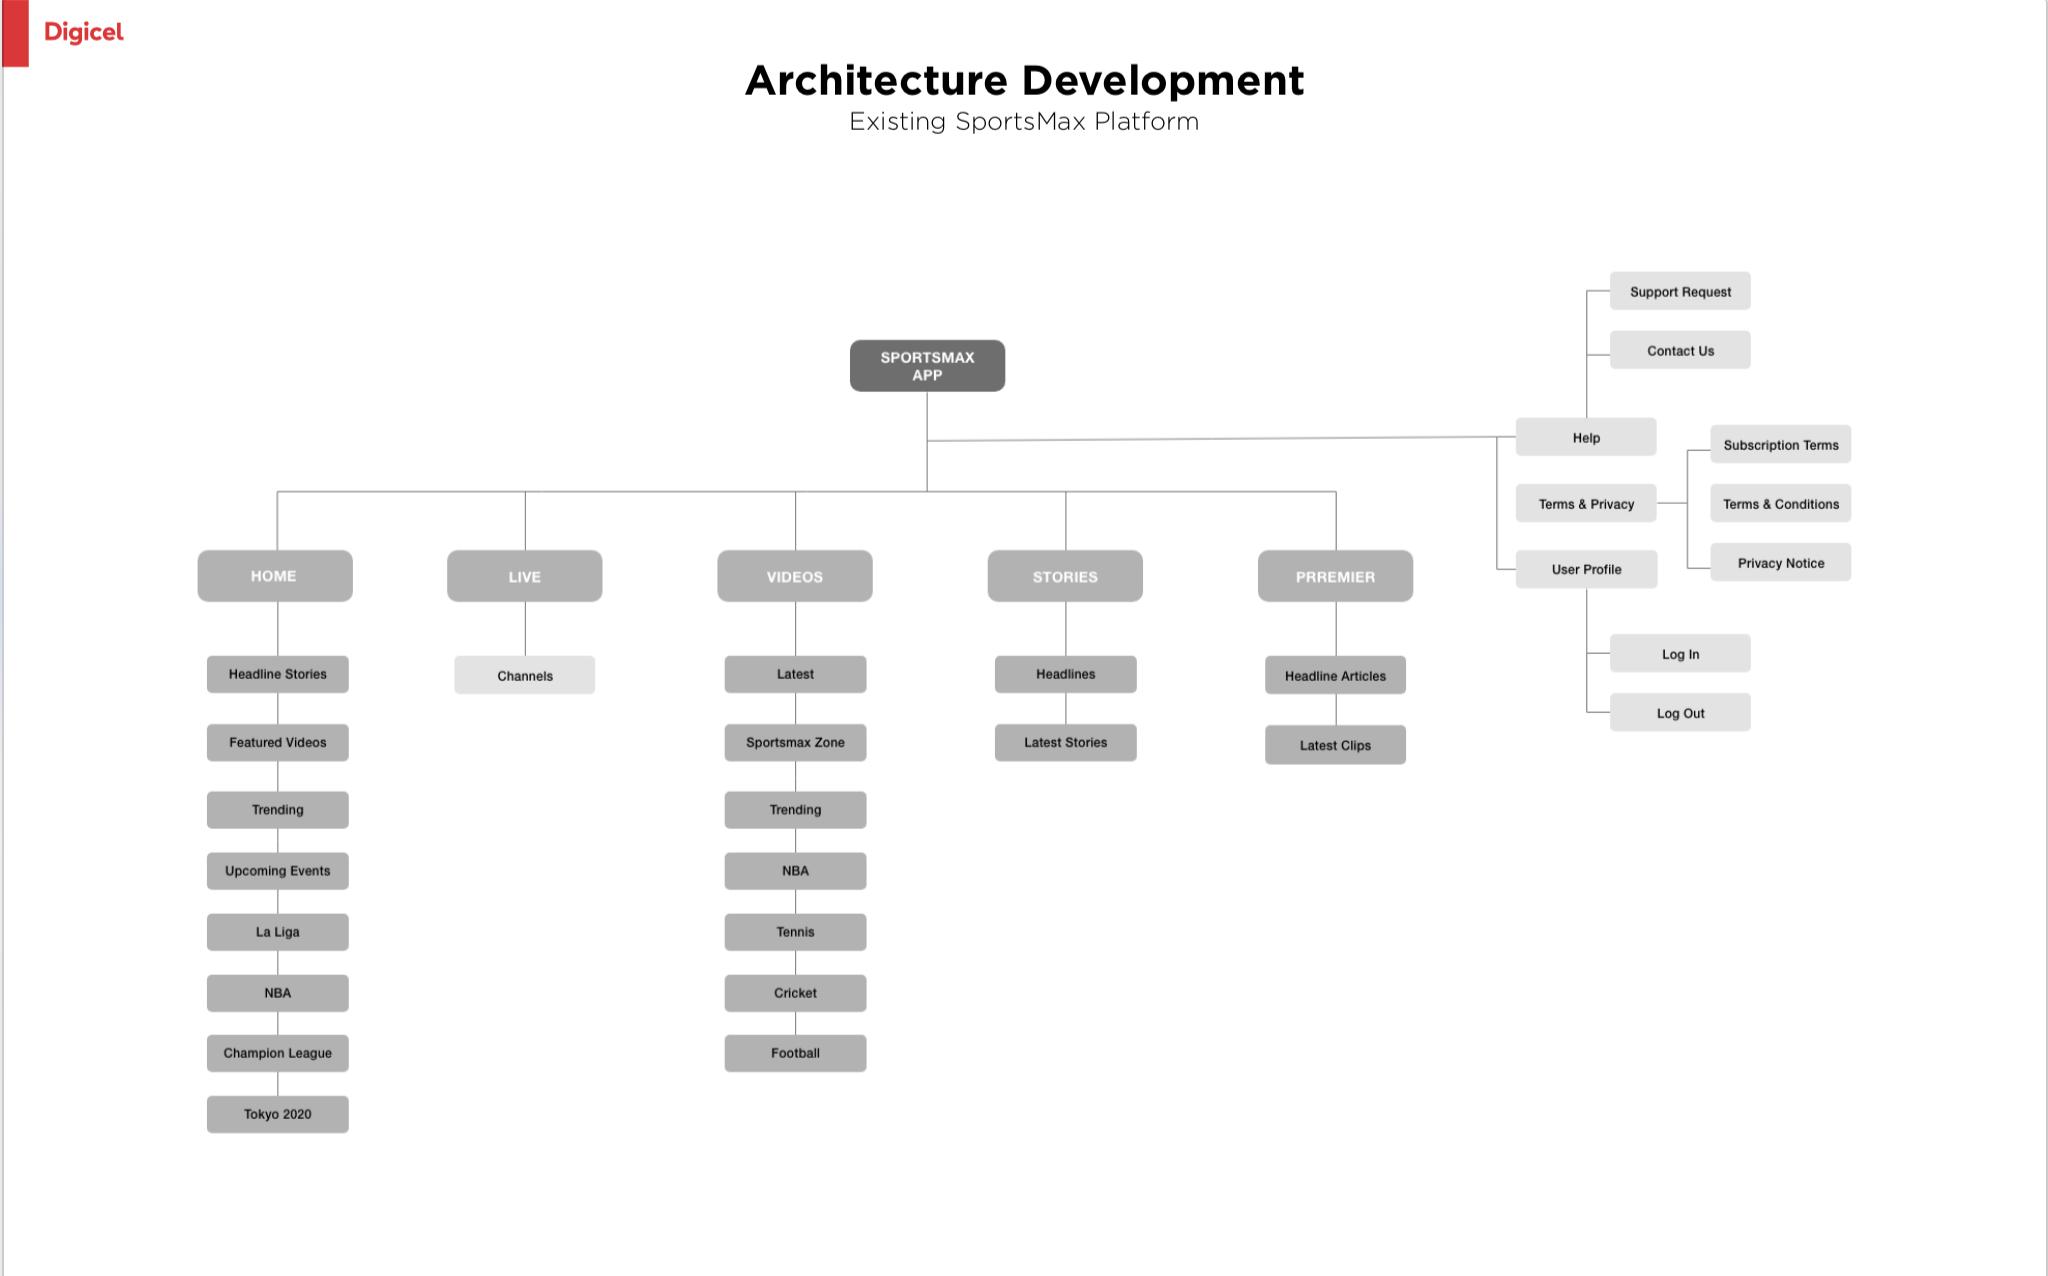 Existing SportsMax Platform Architecture